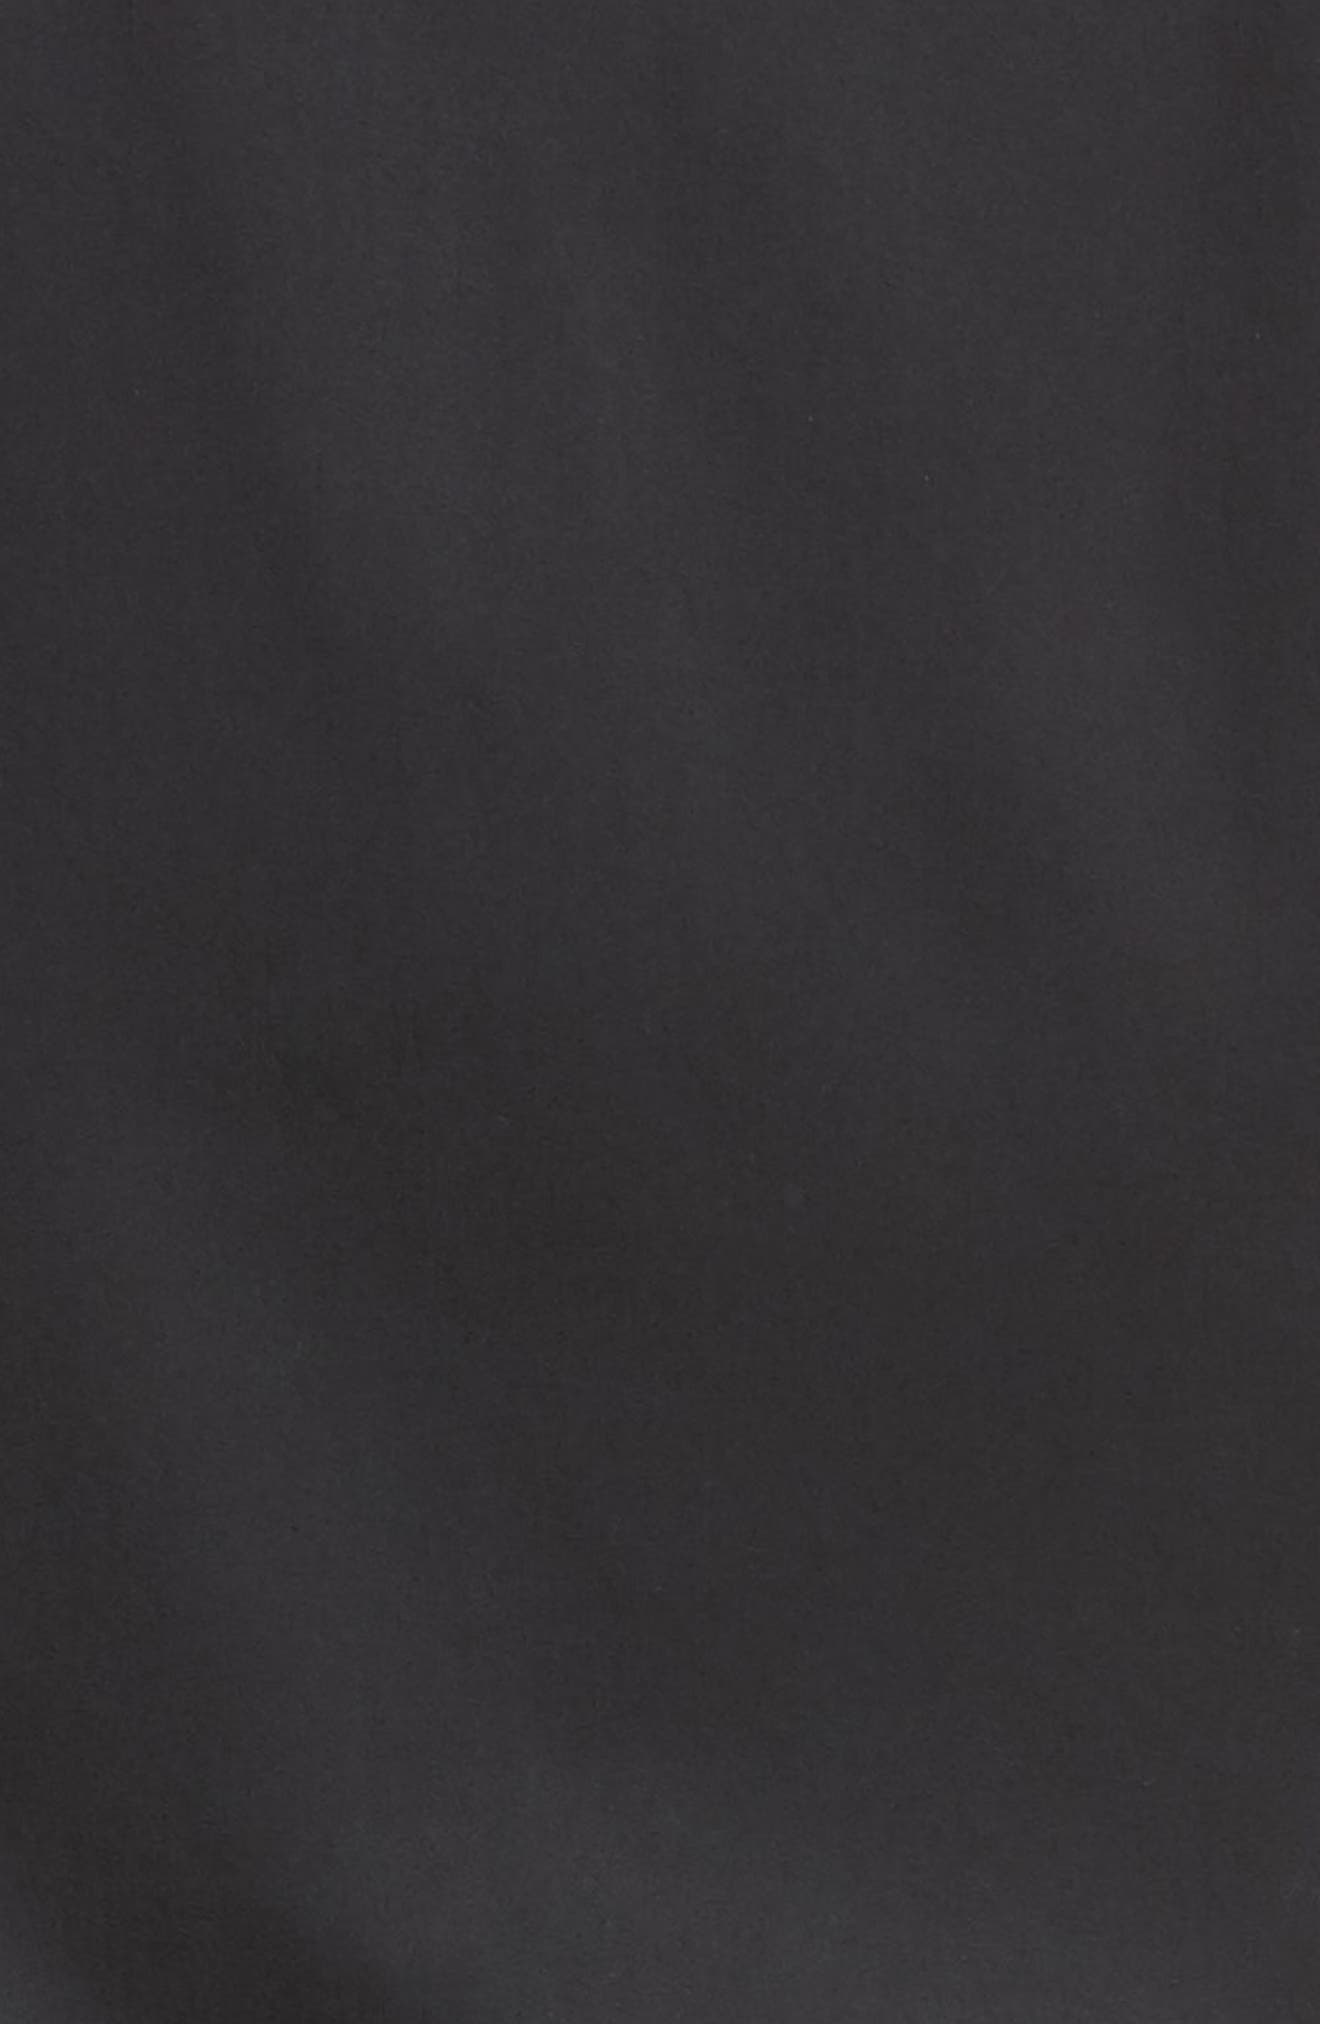 Woven & Knit Jacket,                             Alternate thumbnail 5, color,                             Black